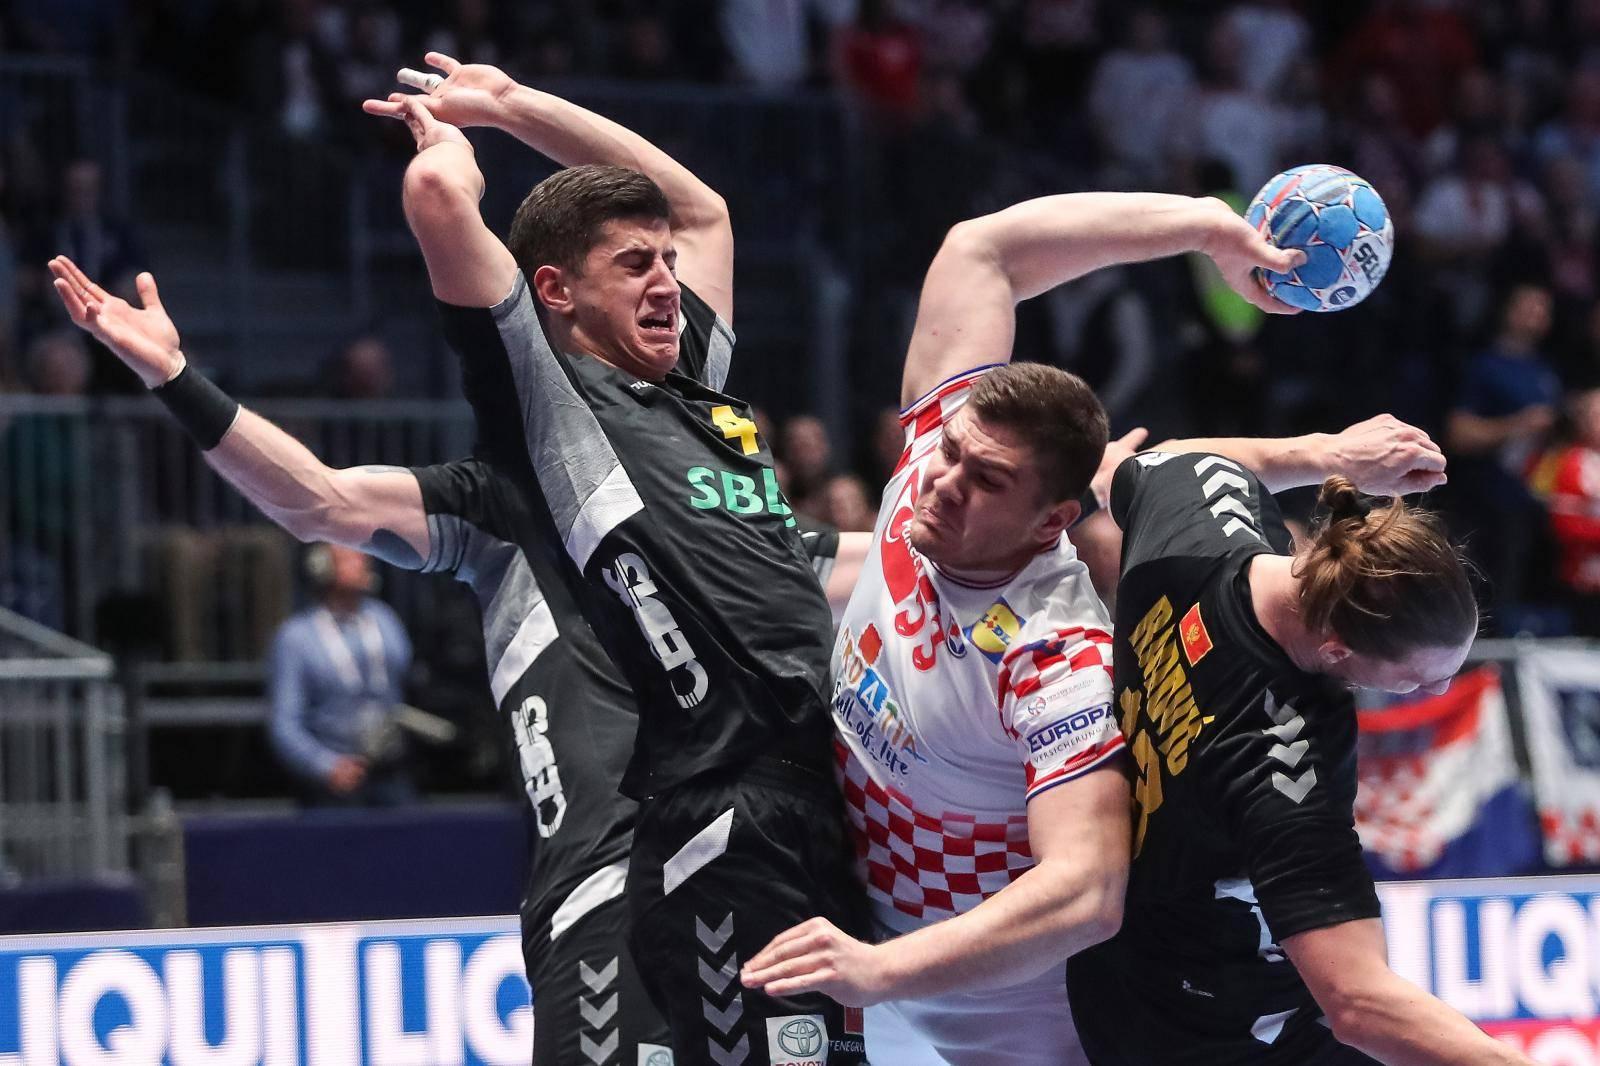 Graz: Rukometna utakmica Hrvatska - Crna Gora